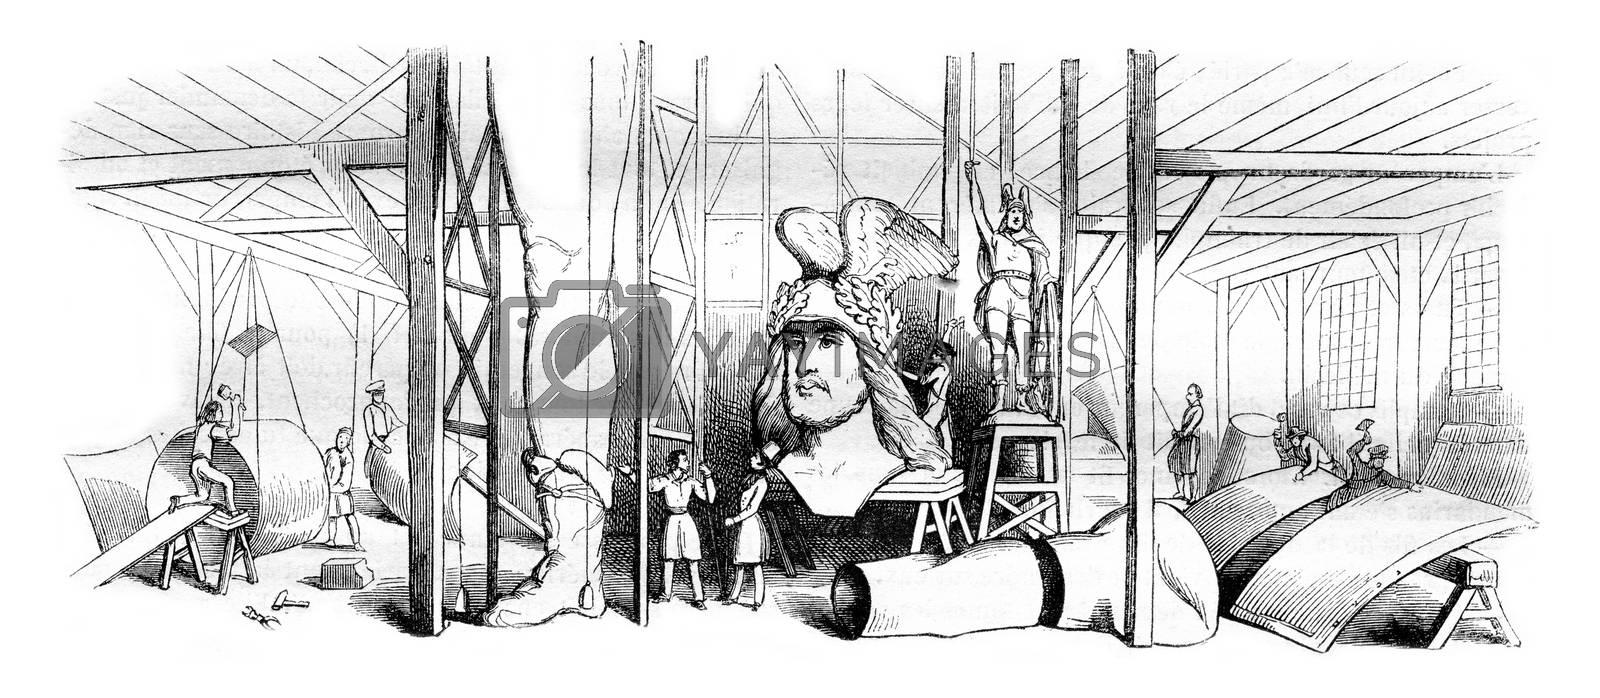 Workshop of Mr. Ernest sculptor Bandol or one voil fragments of the statue of Arminius, vintage engraved illustration. Magasin Pittoresque 1843.